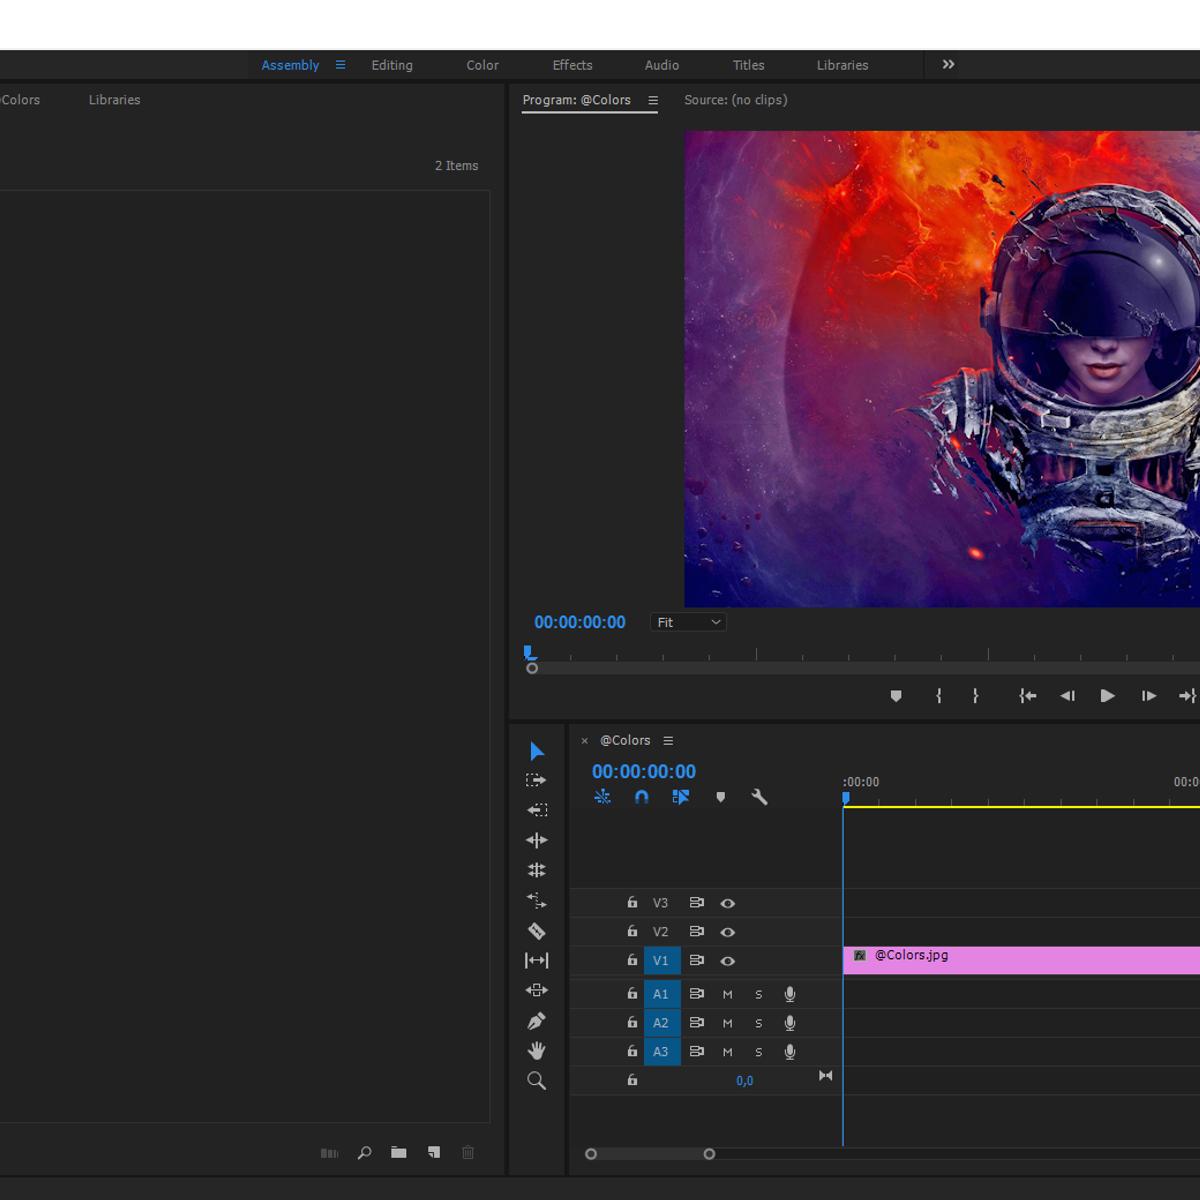 Adobe Premiere Pro Alternatives for Android - AlternativeTo net